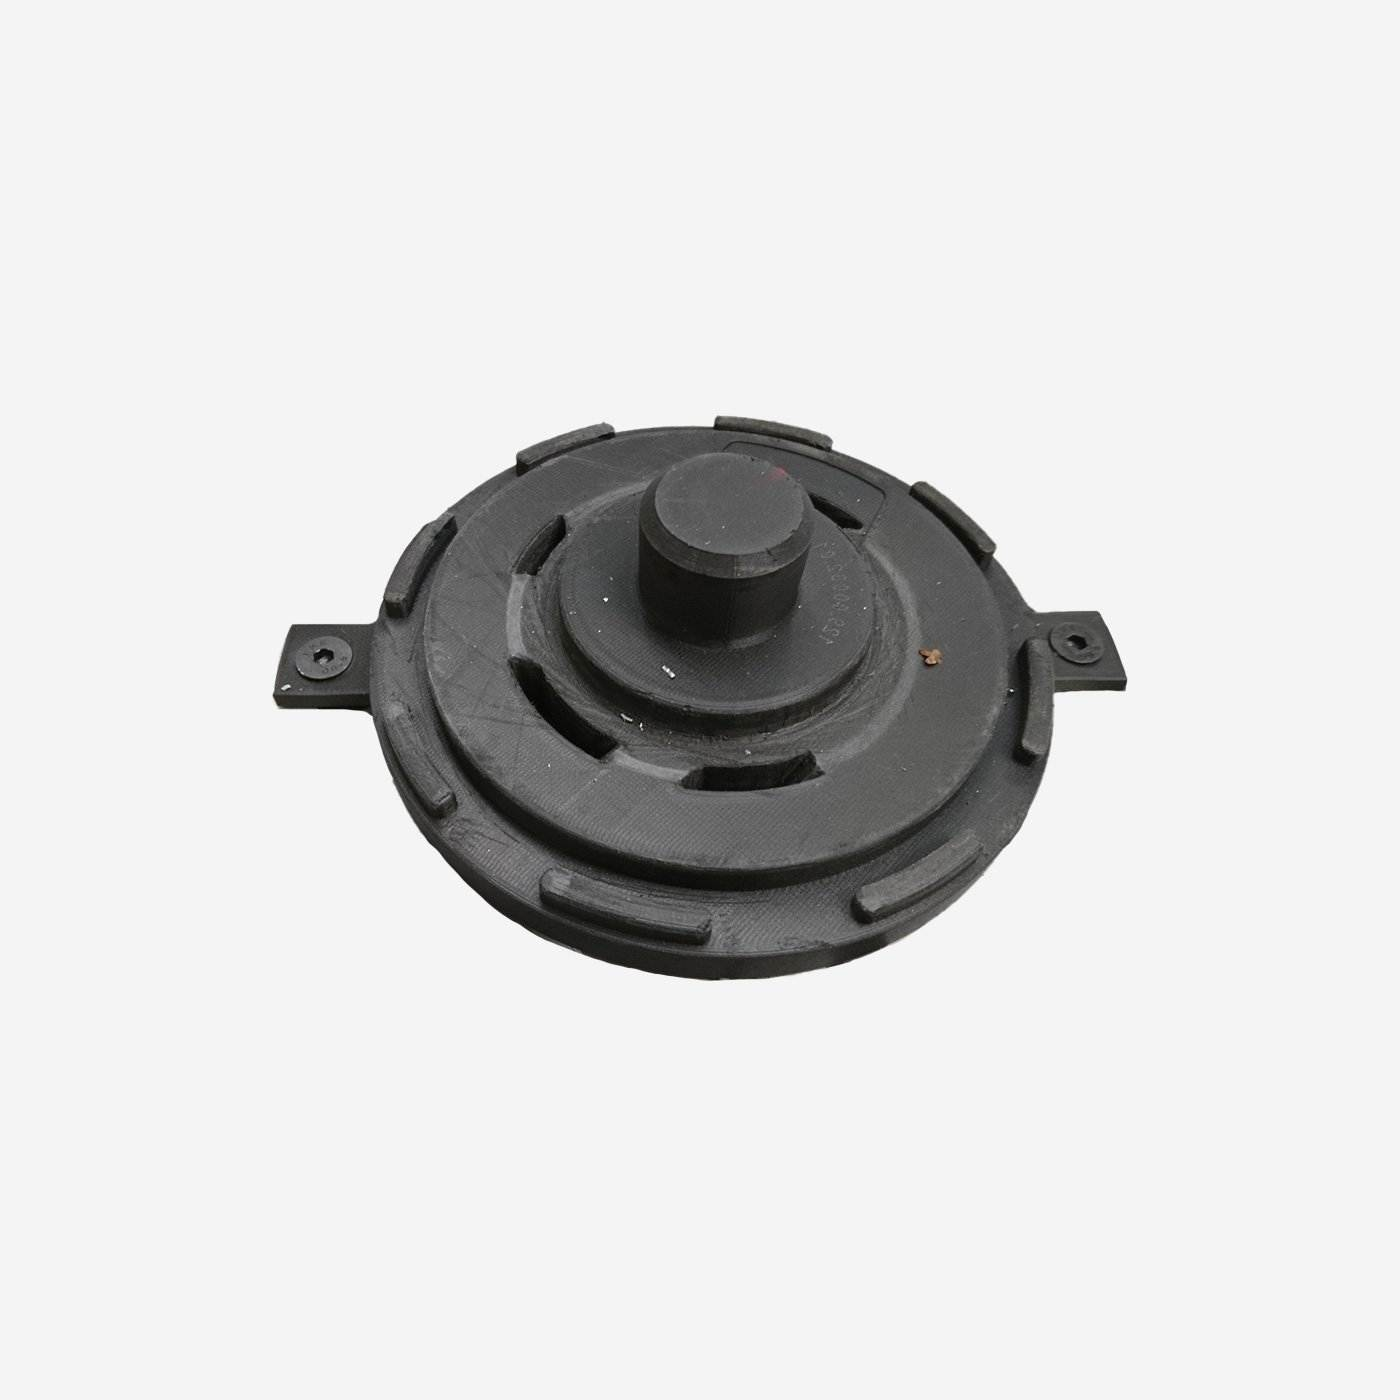 Custom Alignment Jig for CNC Lathe